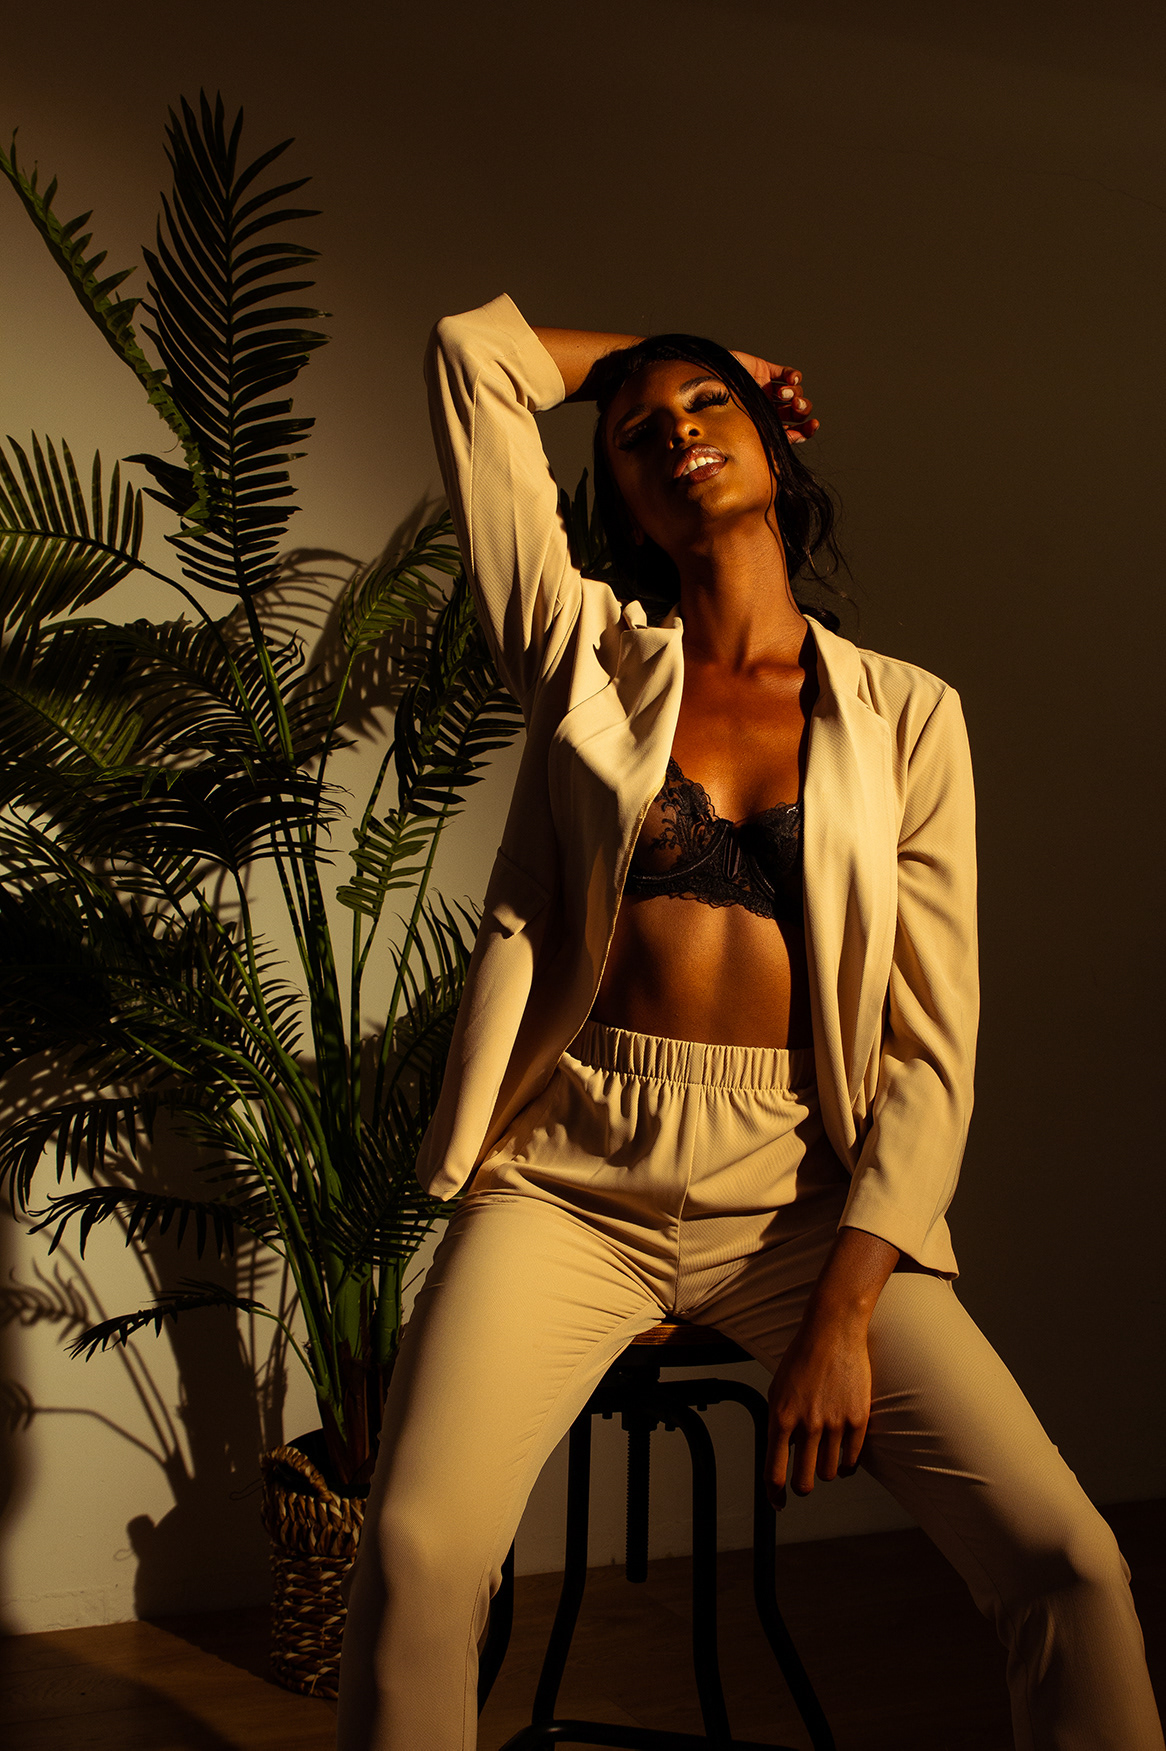 Photograph of Jasmine by Nicole Parkes